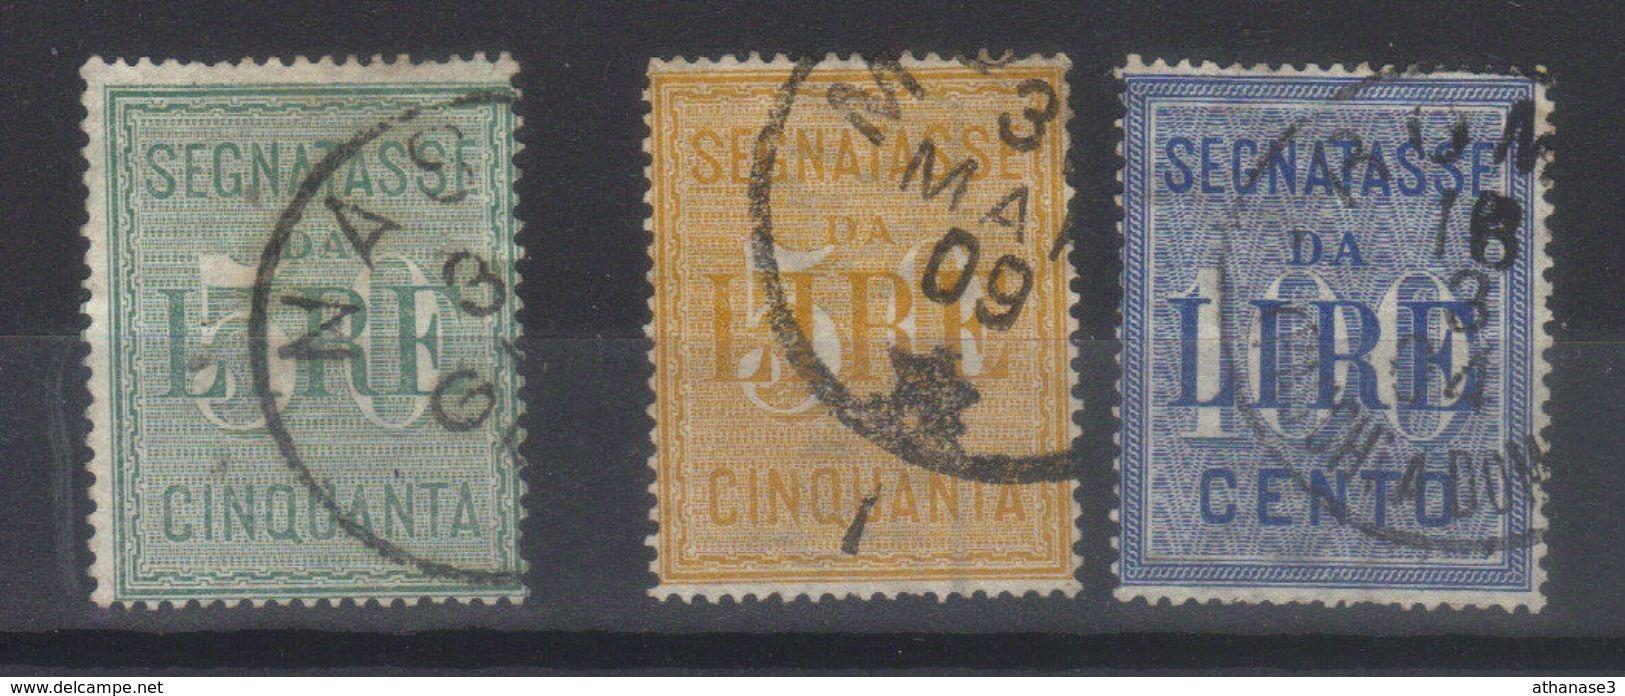 ITALIE   Taxes       N°s  20 (1884),25,26 (1903)     SASS N°s 15, 31 ,32 - 1900-44 Vittorio Emanuele III